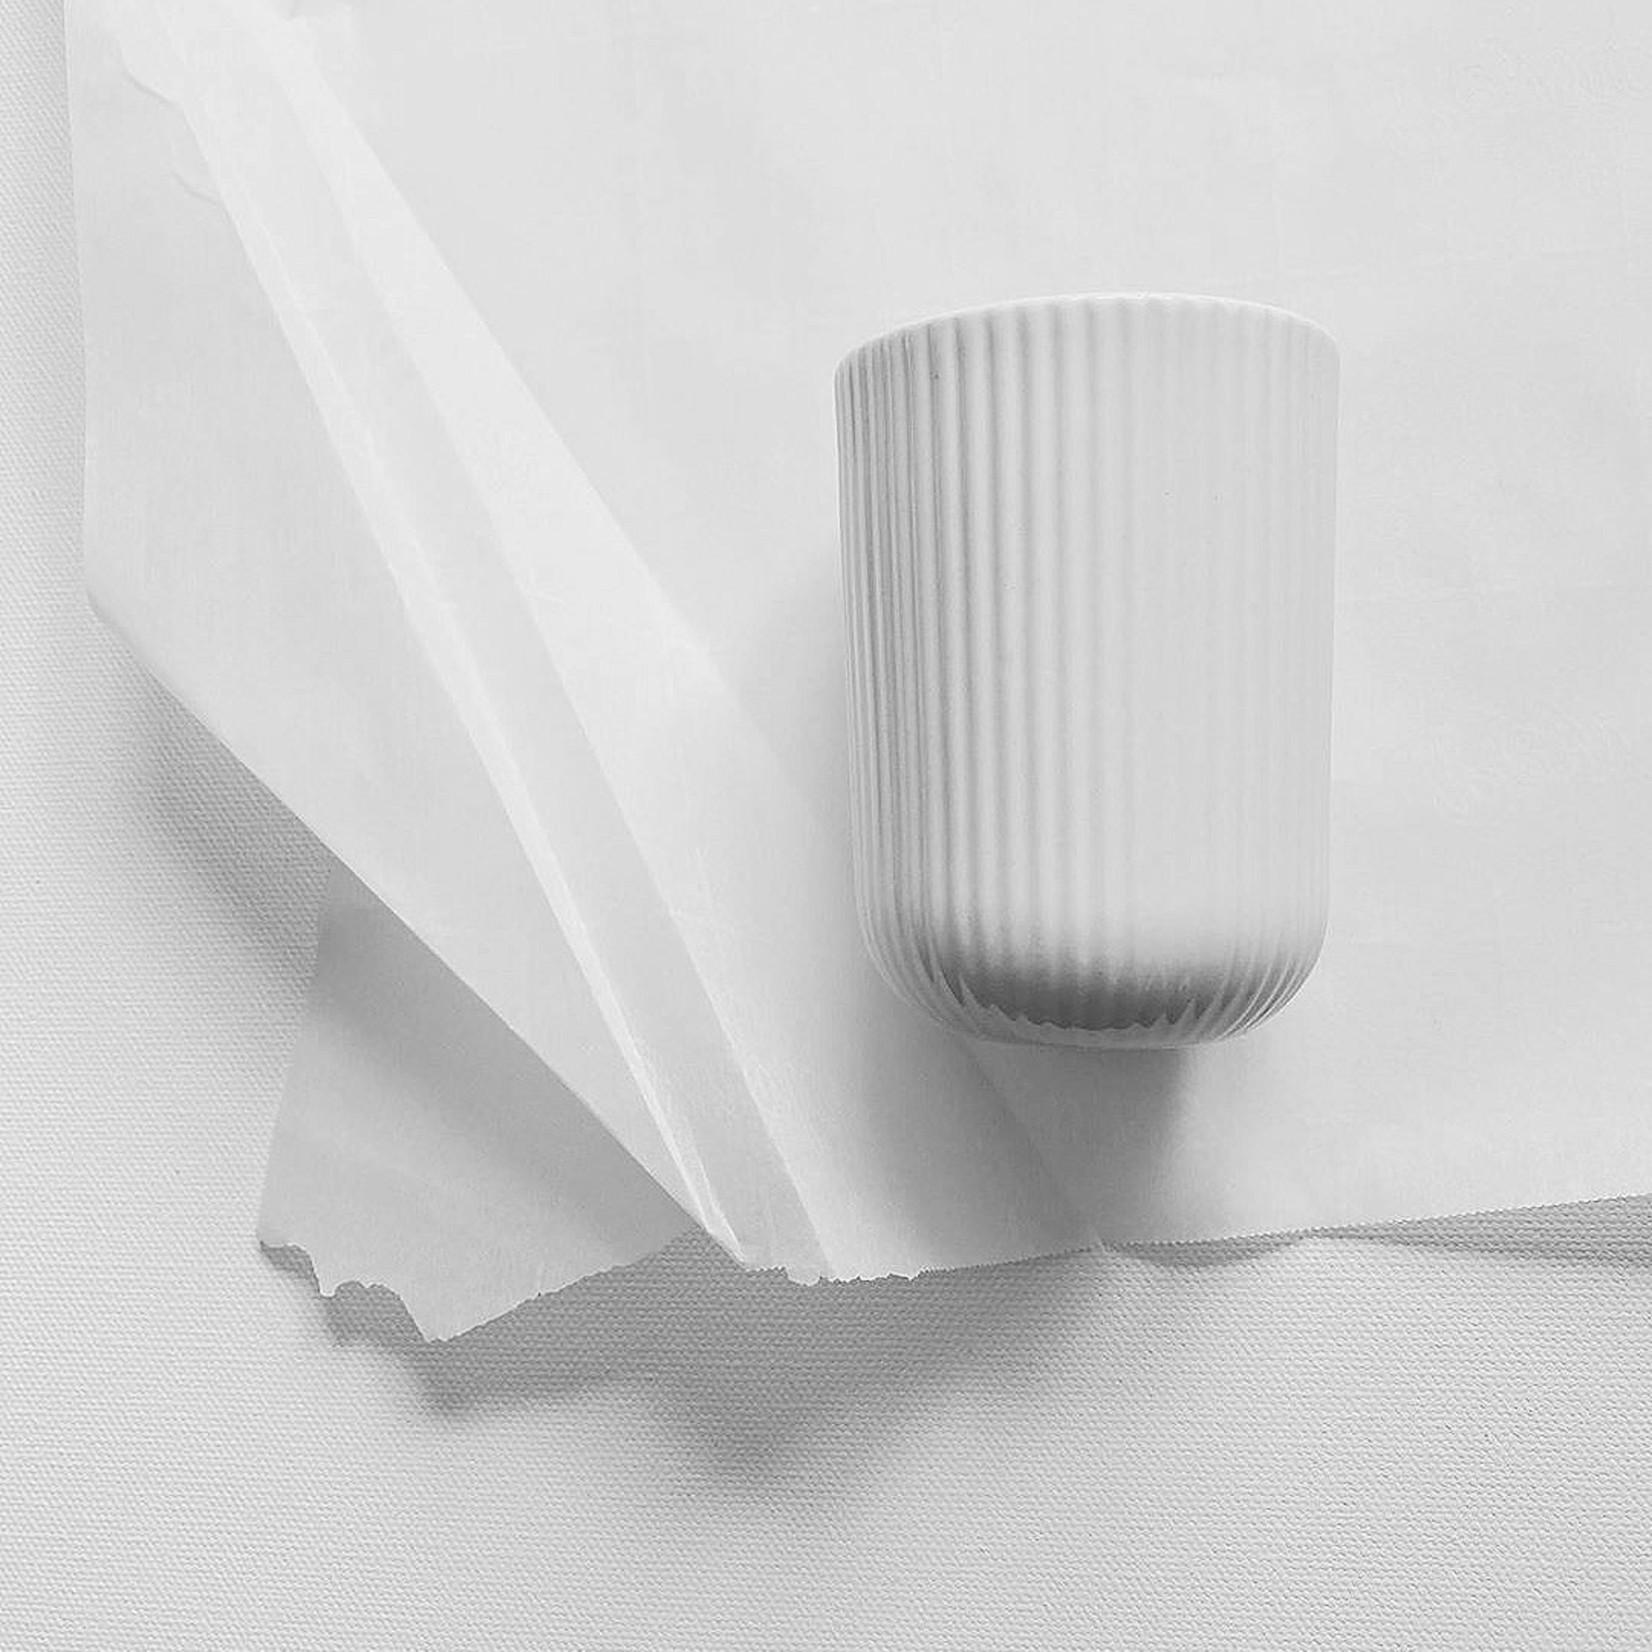 Archive Studio Archive Studio Handmade Coffee Cup Ribbed White